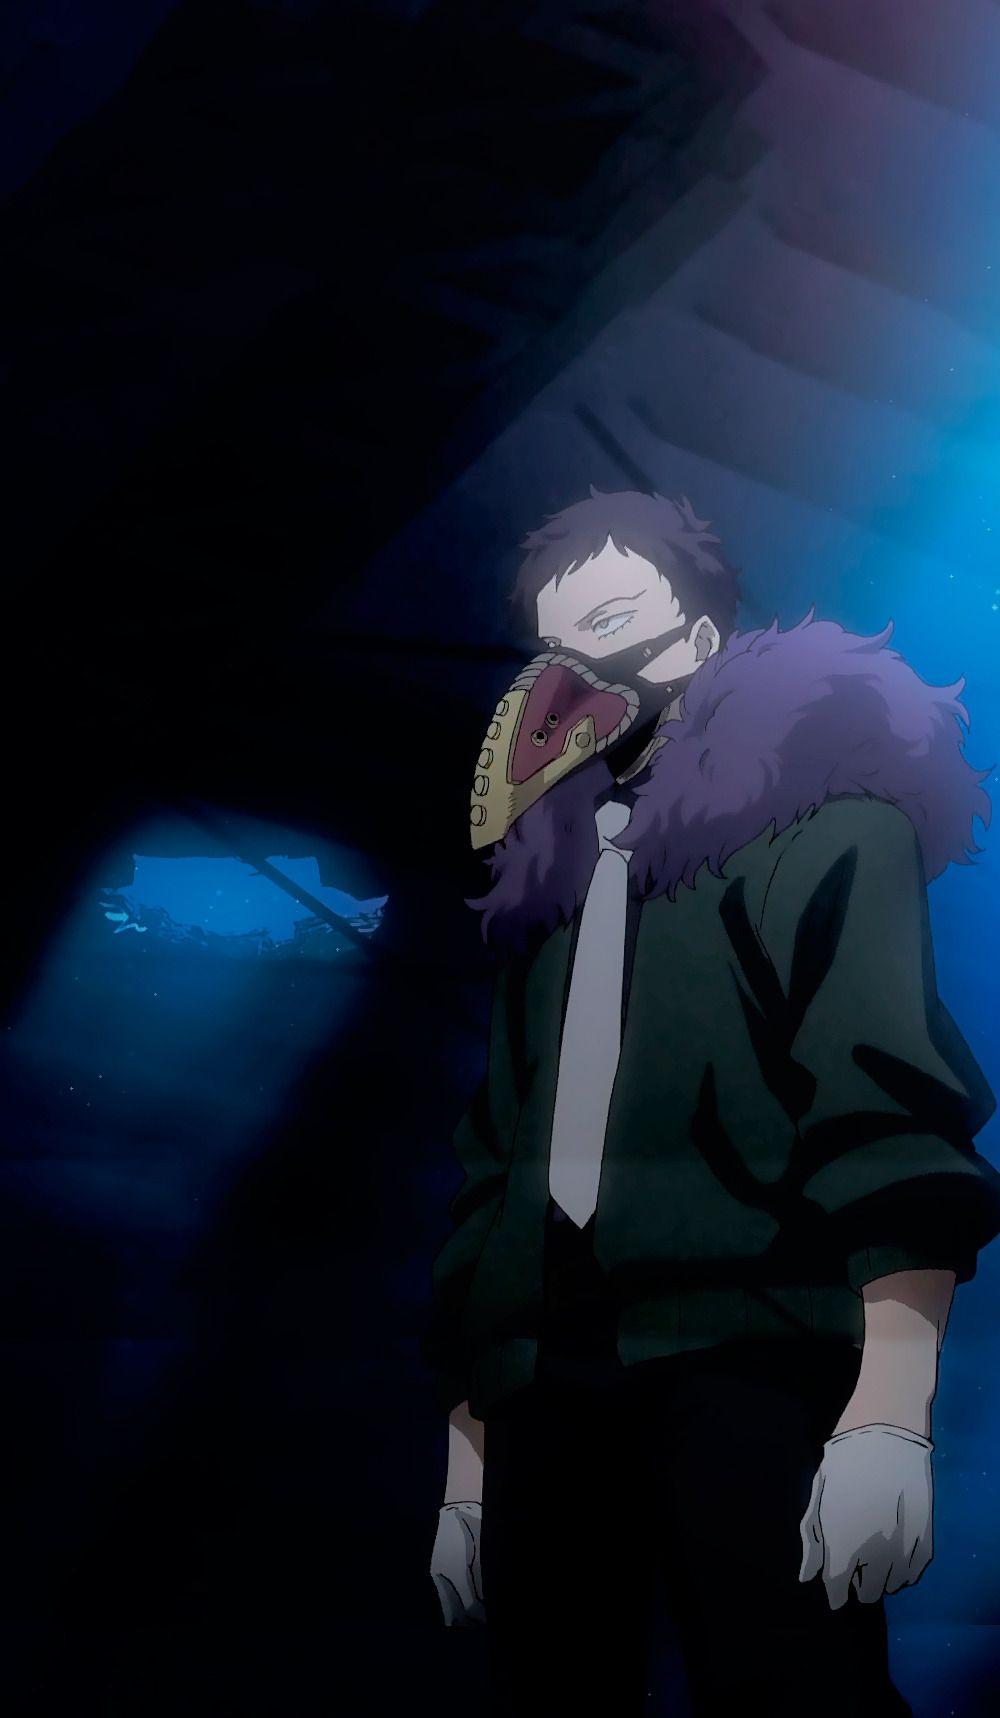 Kai Chisaki Wallpaper Personajes De Anime Wallpaper De Anime Fondo De Anime